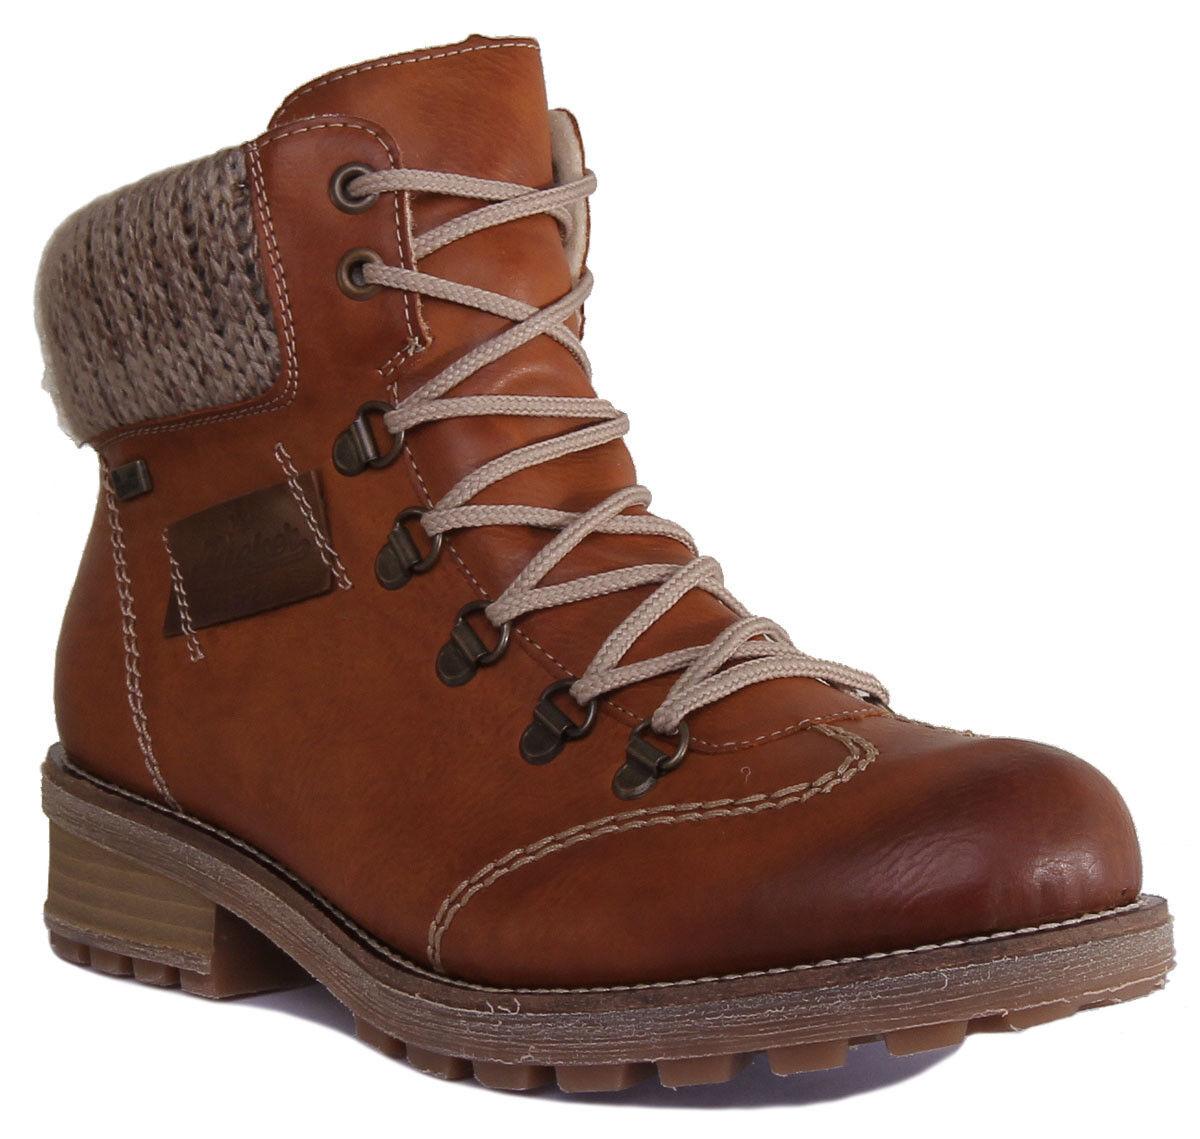 Rieker Z0444 24 Women Lace up Tan Hiker Boot Size UK Siz e 3 - 8